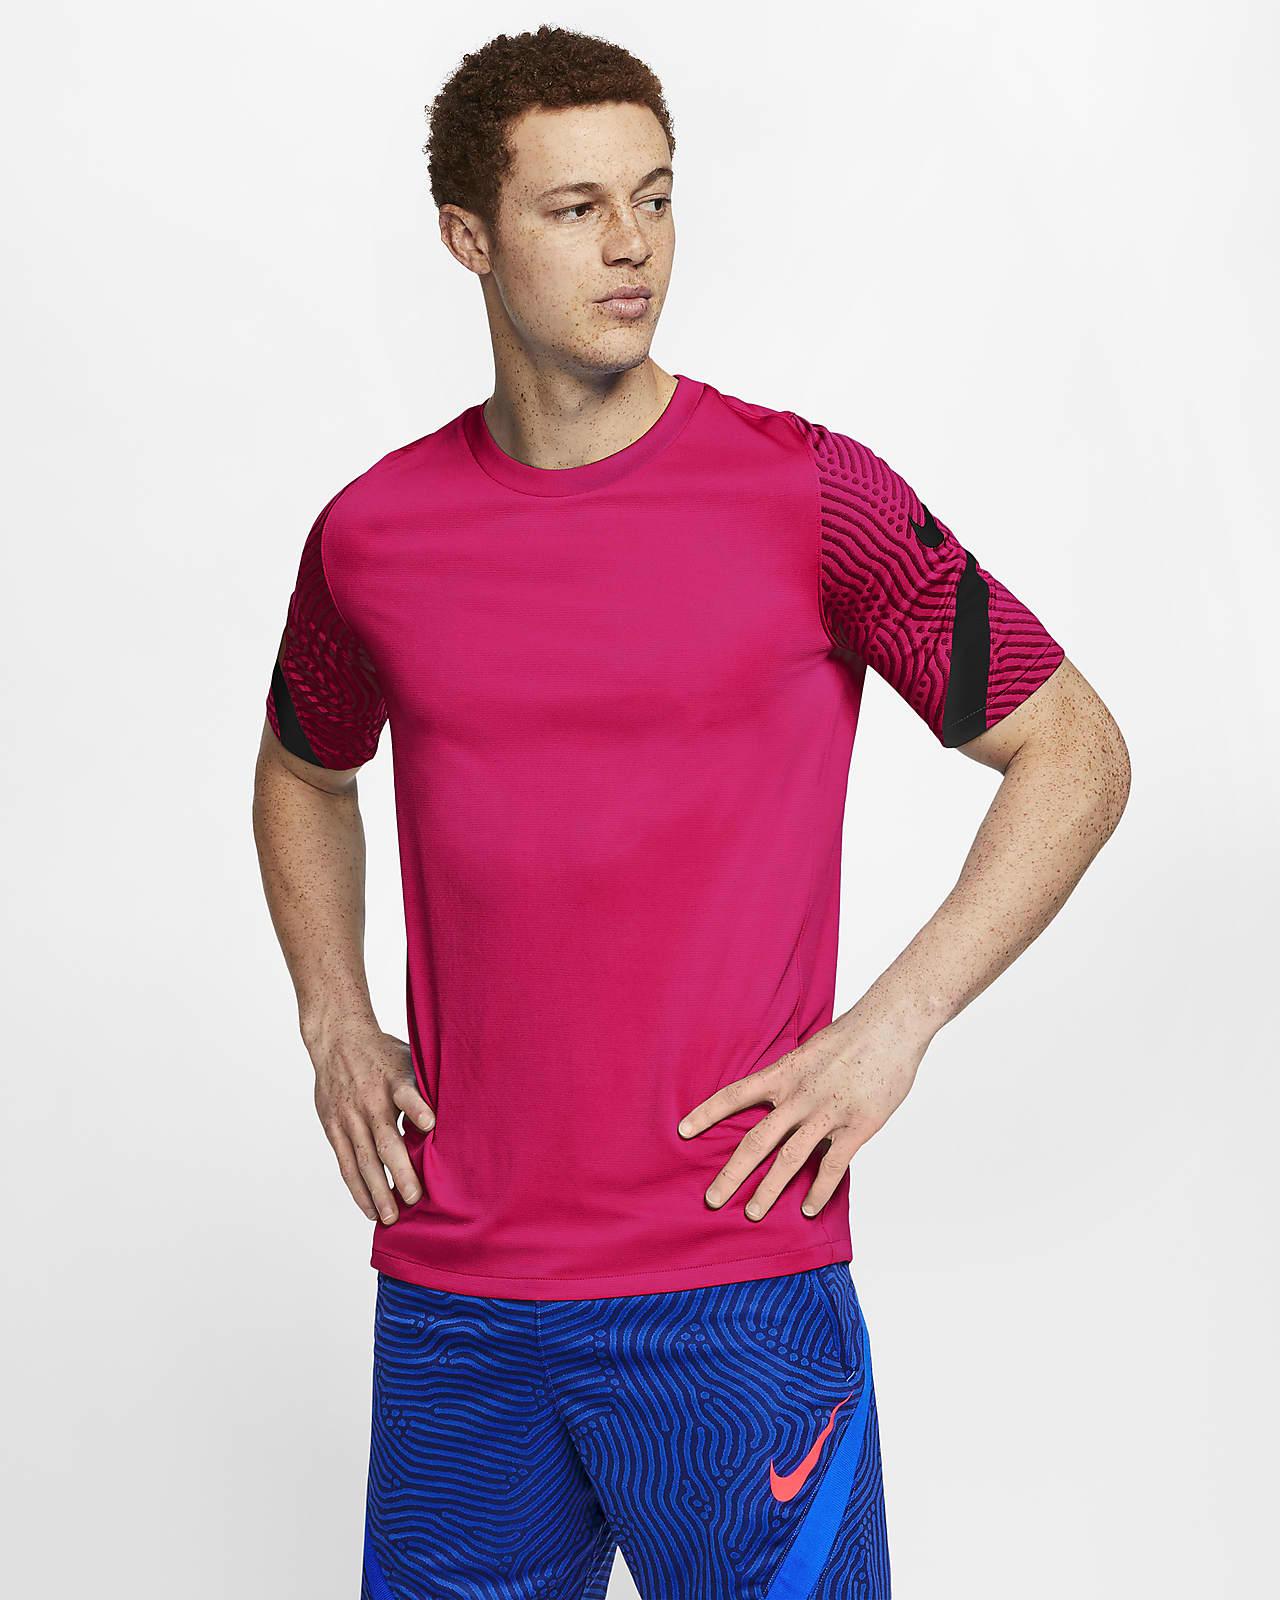 Prenda superior de fútbol de manga corta para hombre Nike Dri-FIT Strike